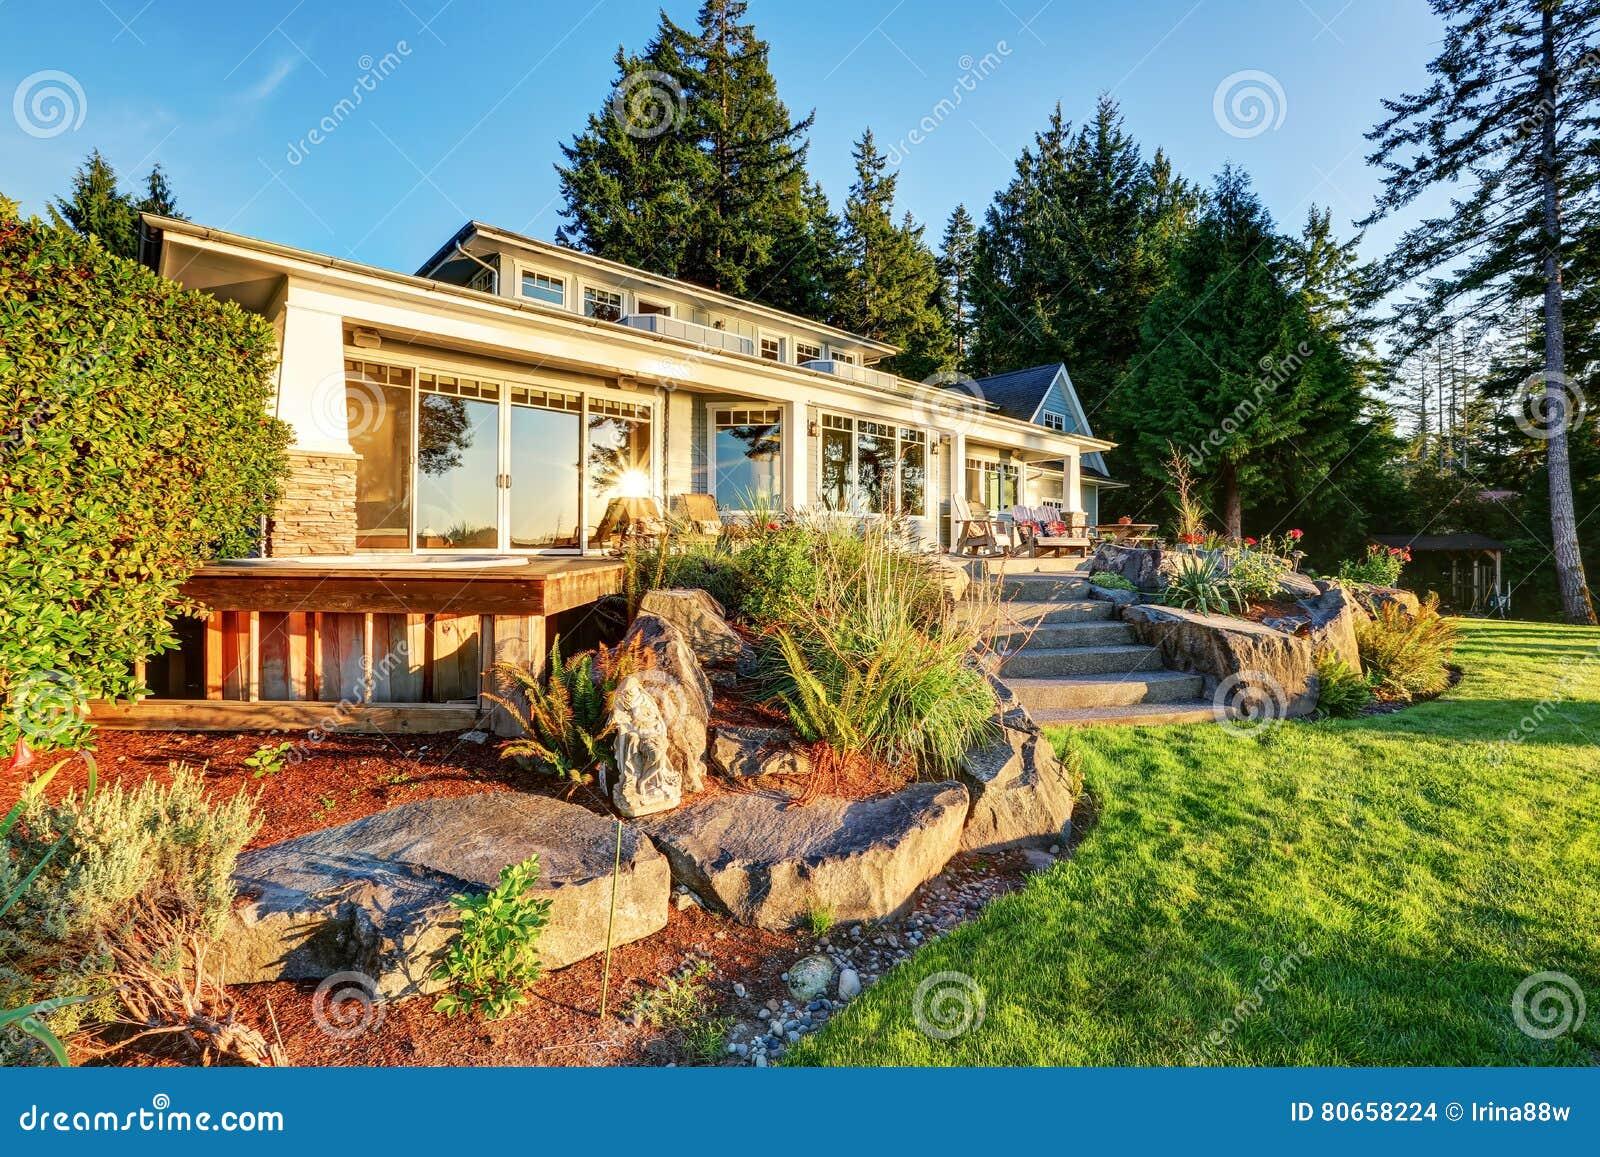 Back Yard Of Waterfront House At Sunset Stock Photo ... on Waterfront Backyard Ideas id=83243